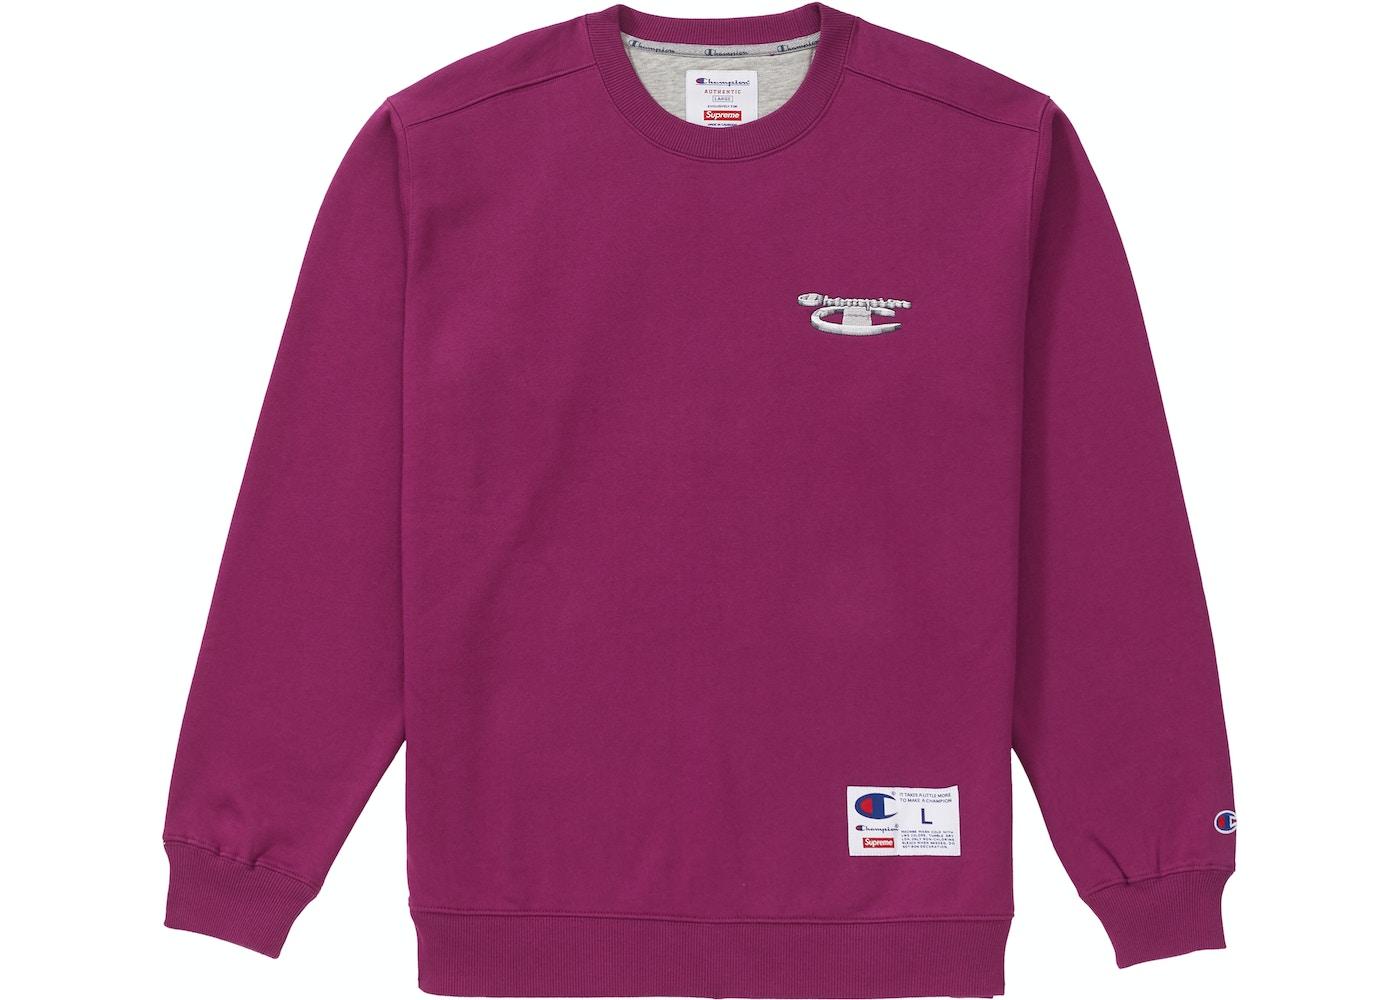 634cb4ae9 Streetwear - Supreme Tops/Sweatshirts - New Highest Bids